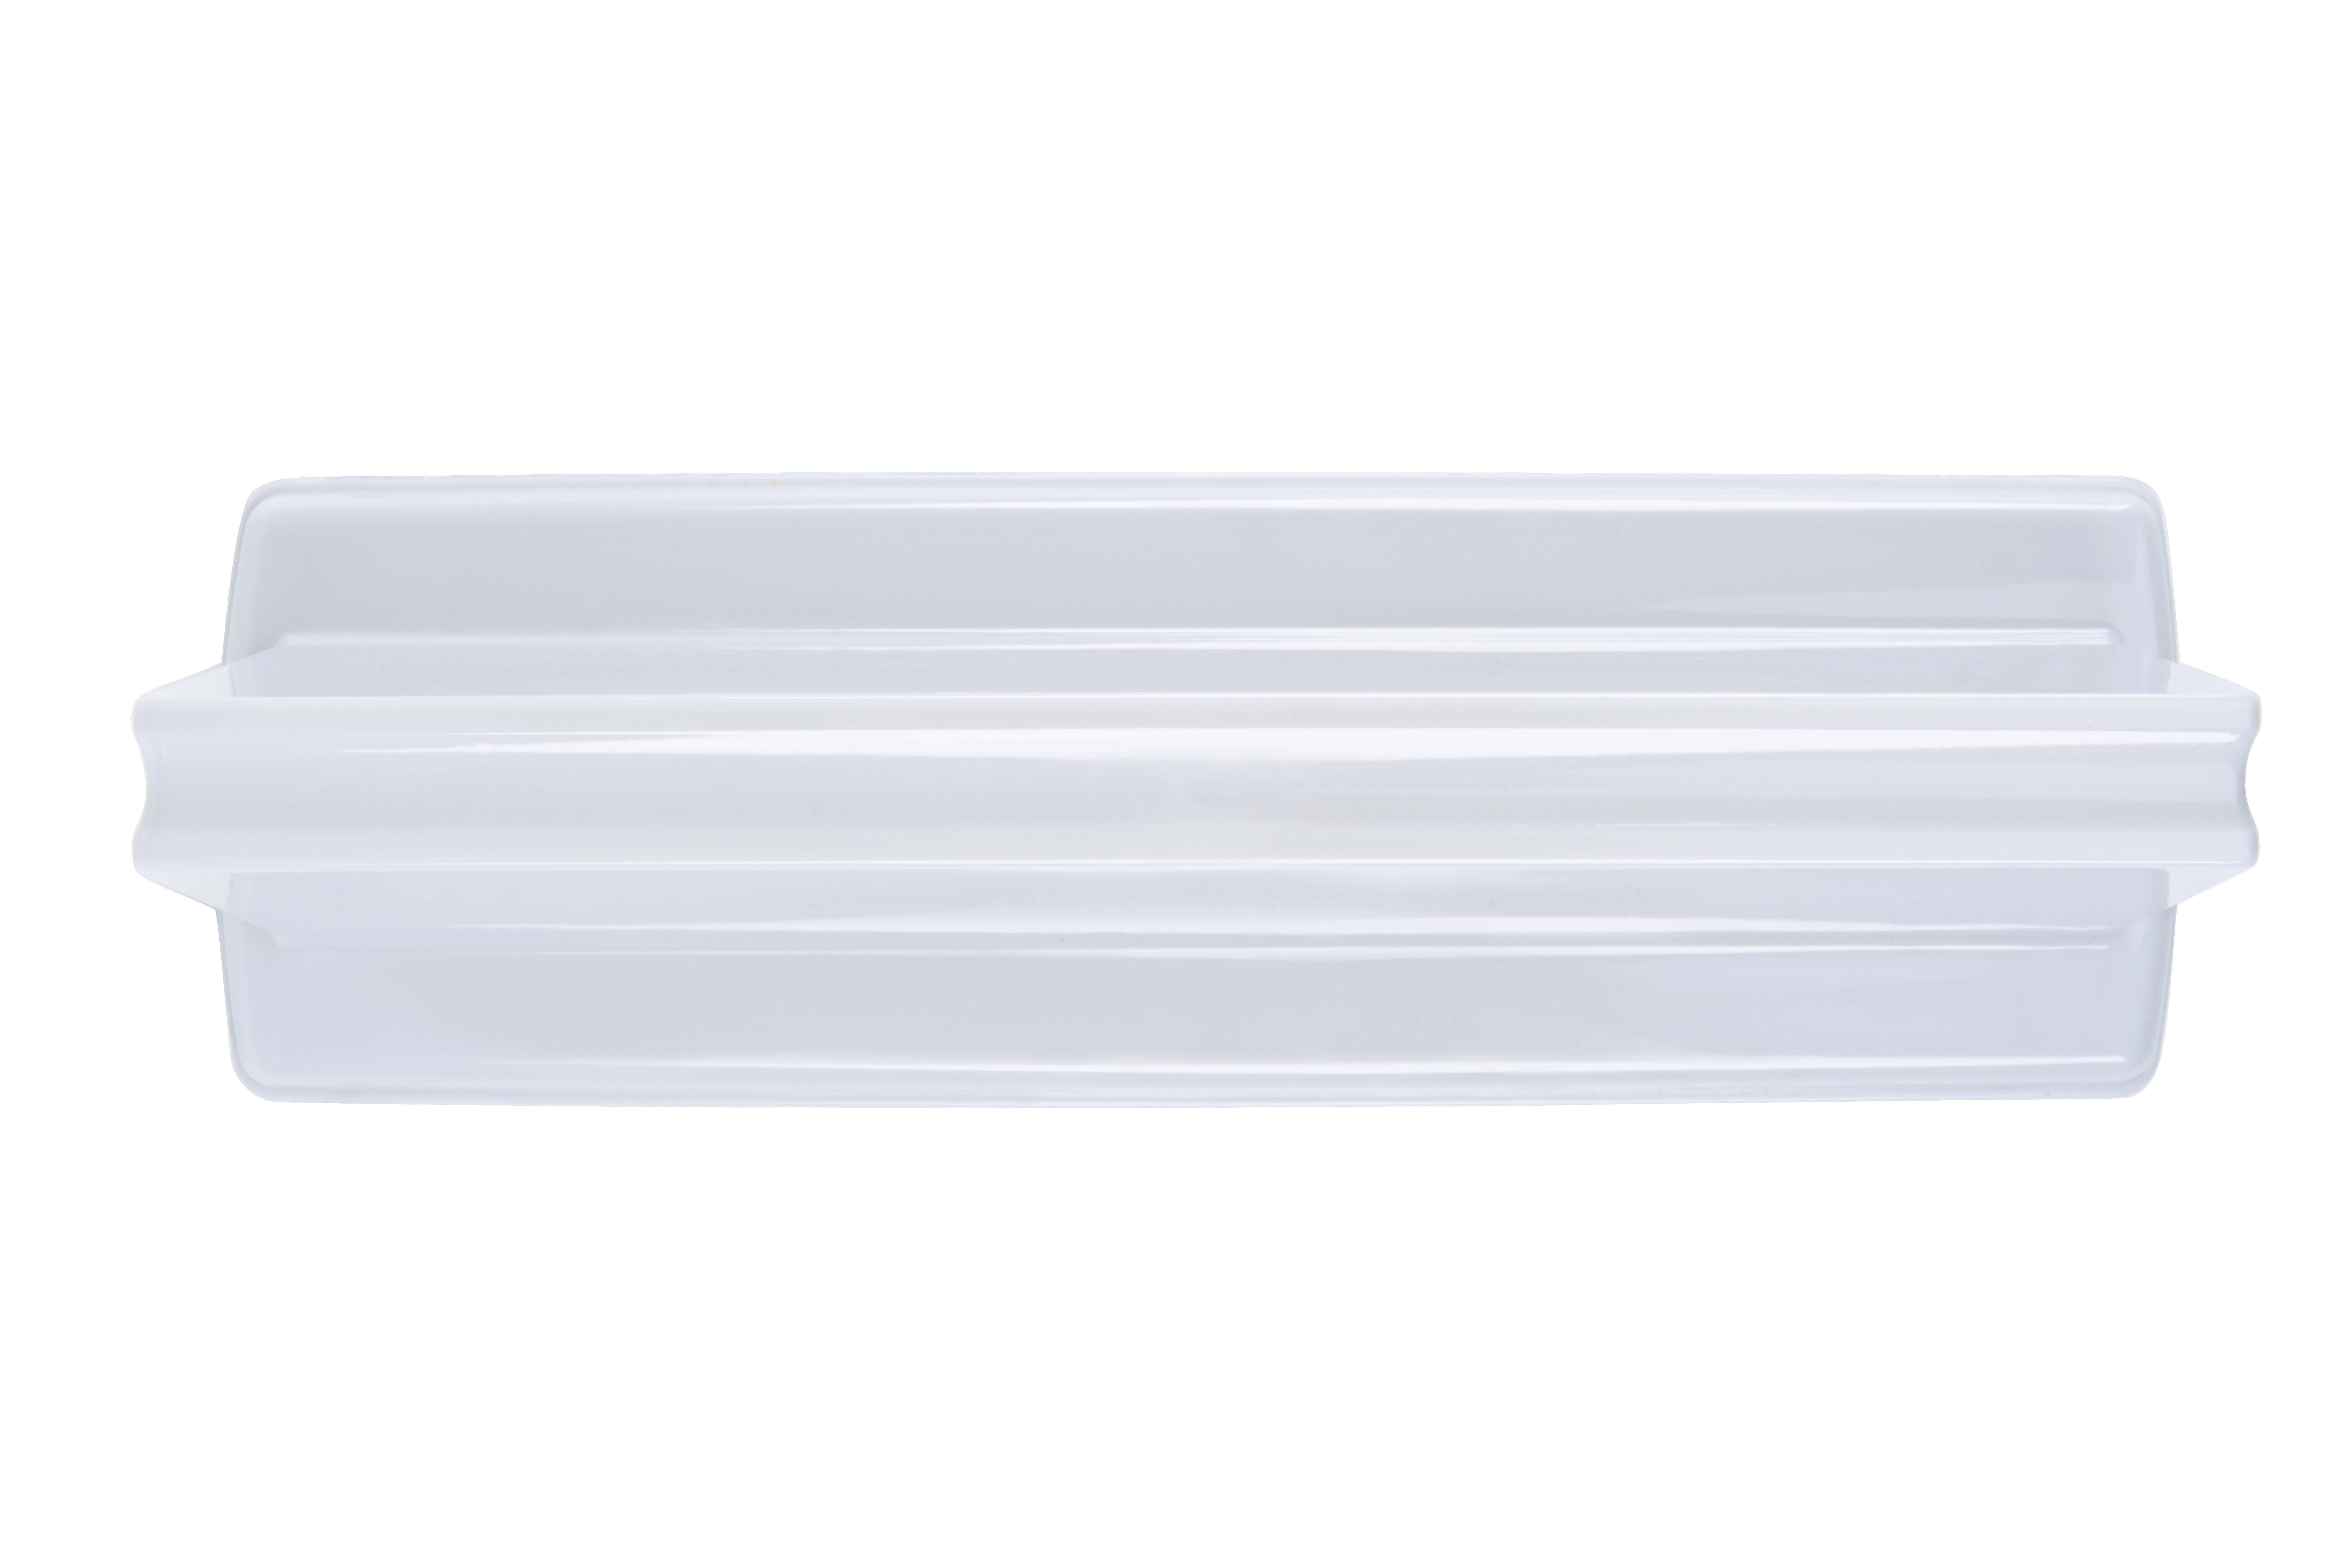 Lampa emergenta led Intelight 99905   3h mentinut/nementinut test automat 3